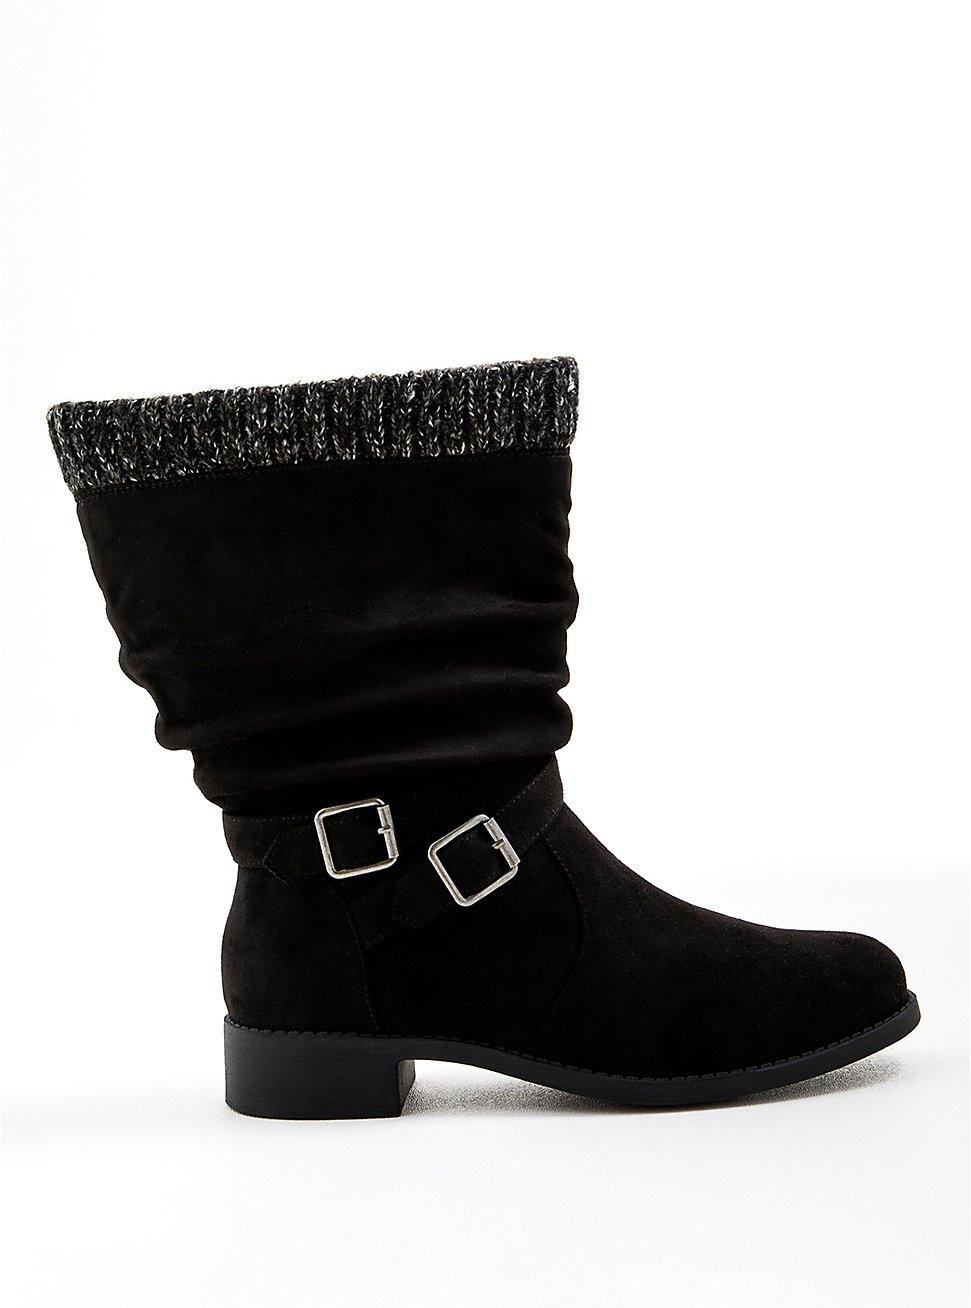 Sweater-Trim Boot - Black Faux Suede (WW), BLACK, hi-res